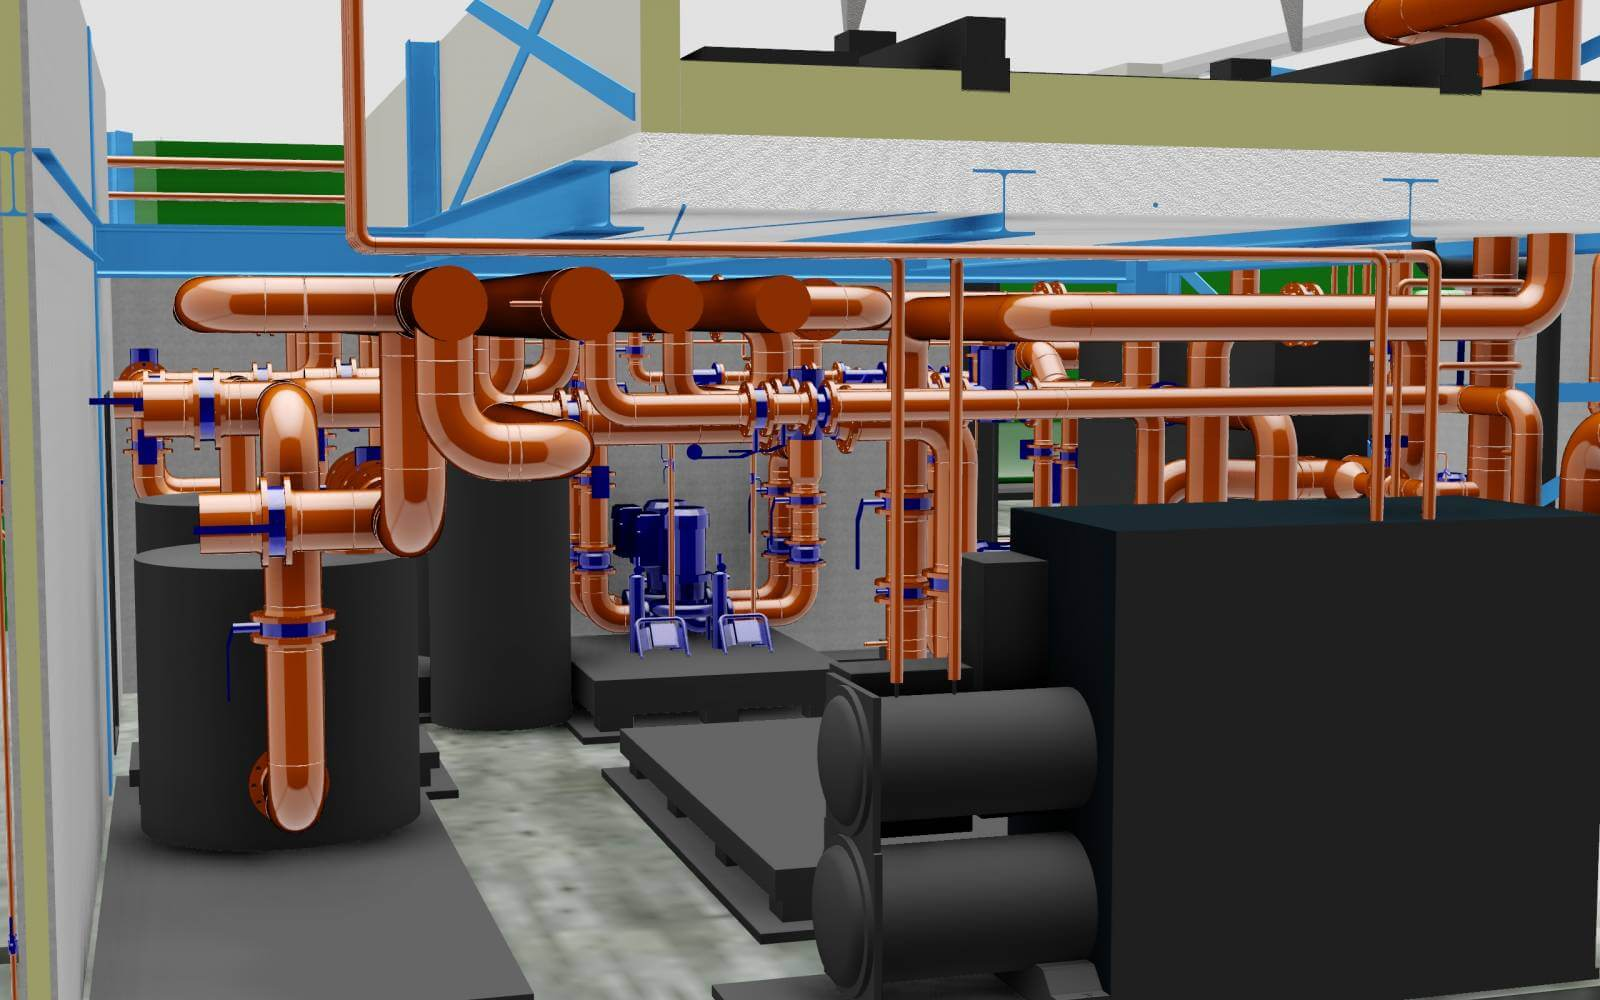 3D tekeningen - TU Delft